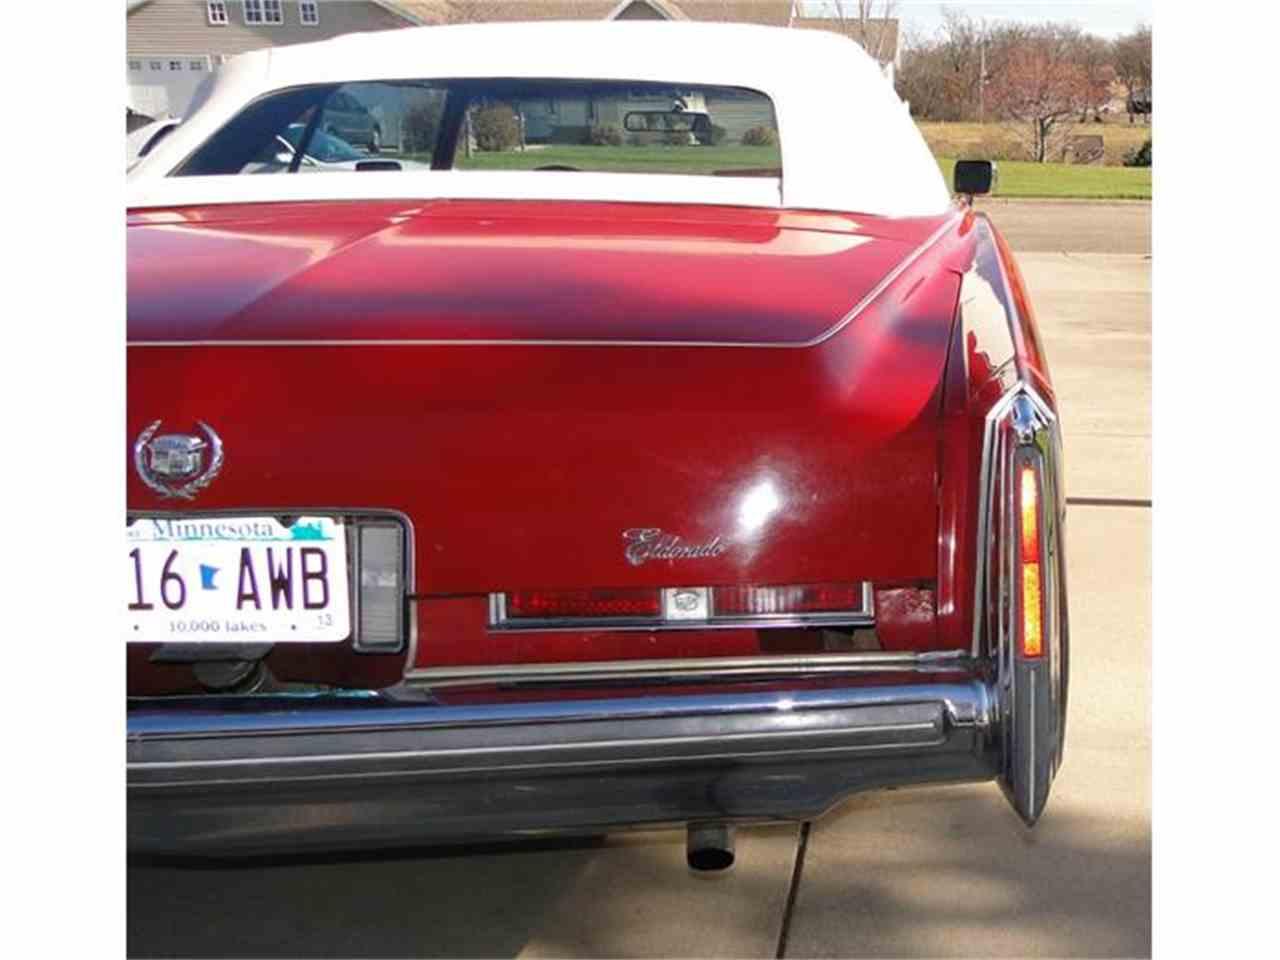 Large Picture of '75 Cadillac Eldorado located in Prior Lake Minnesota - $9,500.00 - CXH4